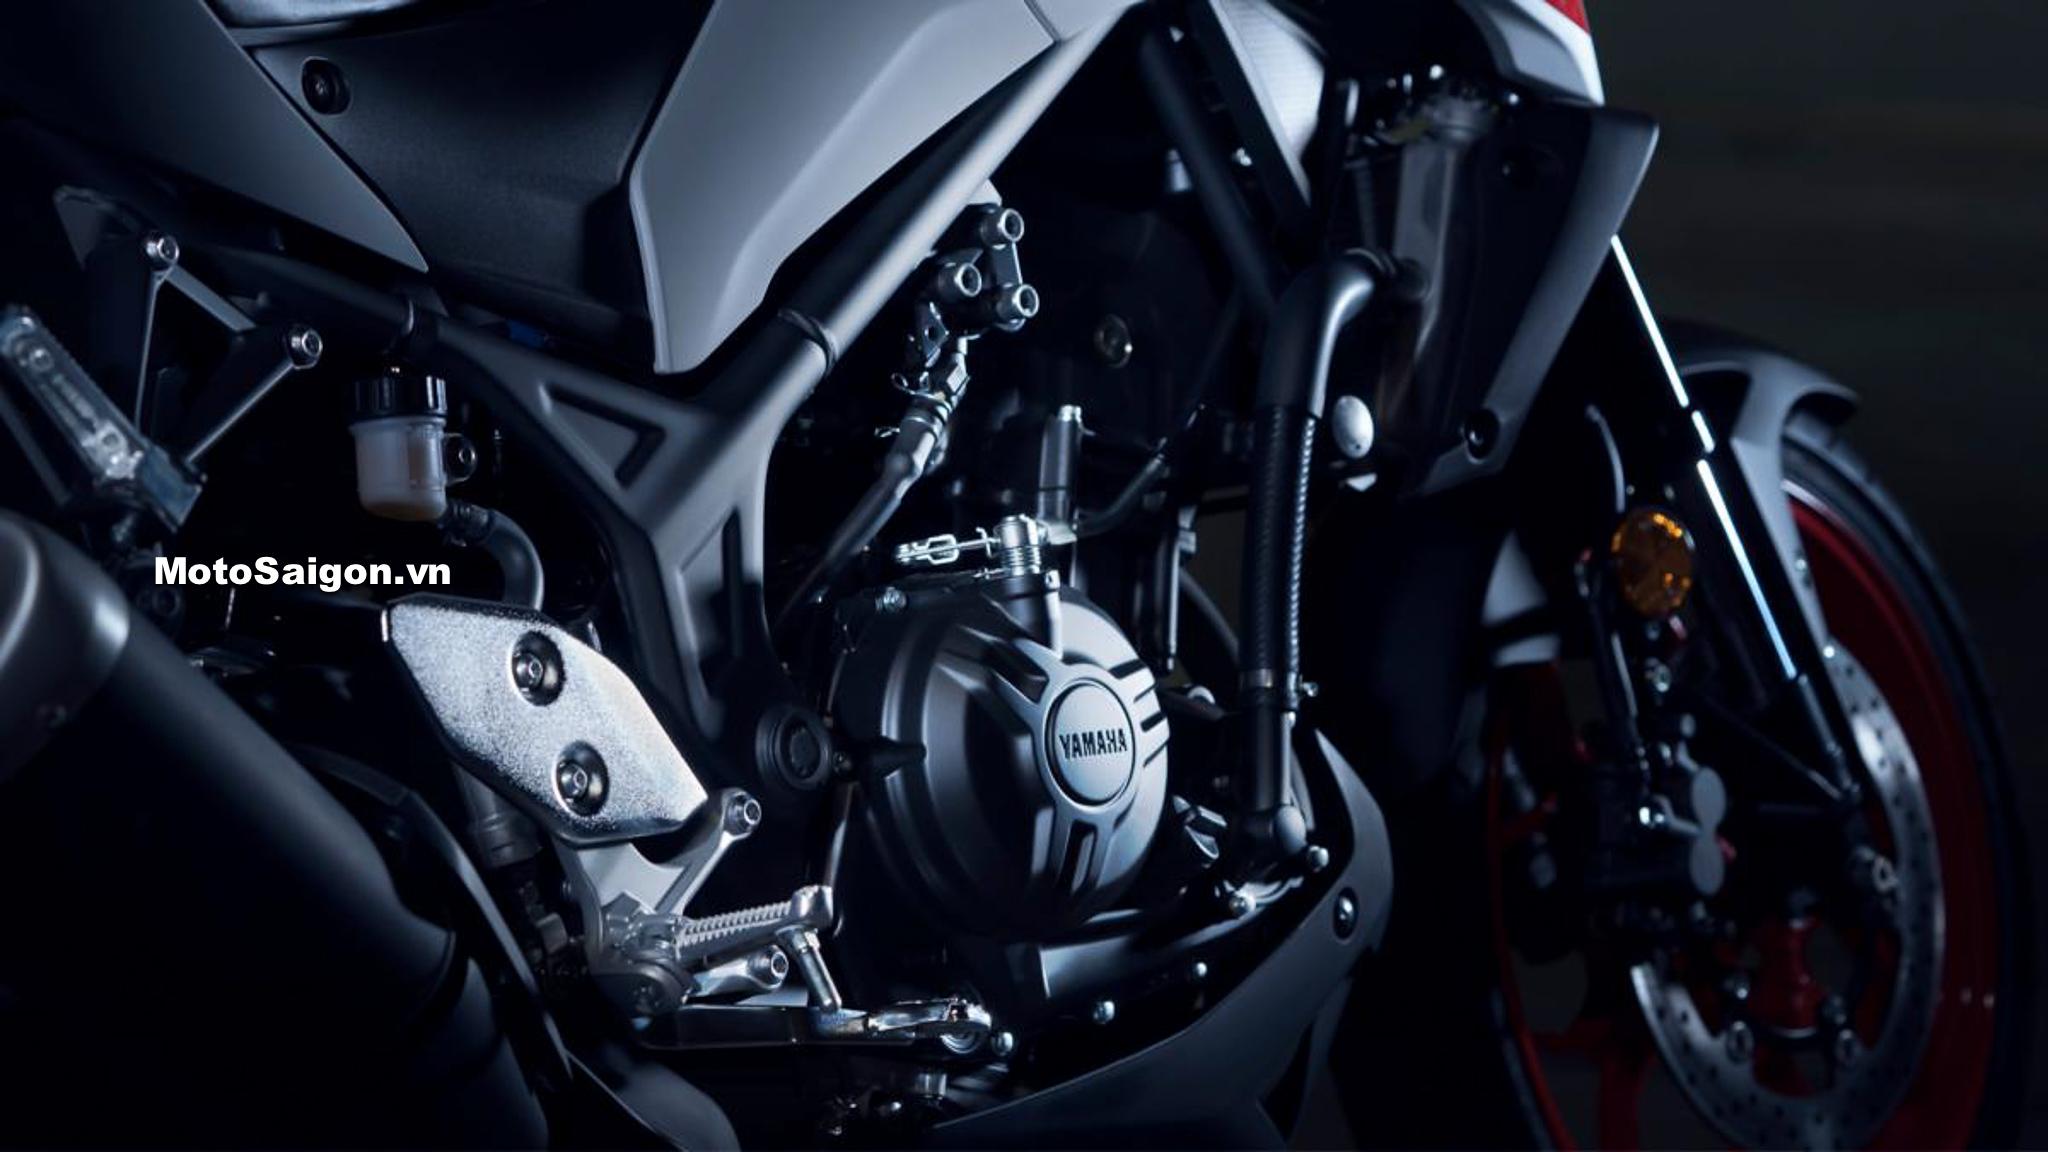 yamaha mt 03 abs 2020 danh gia xe motosaigon 19